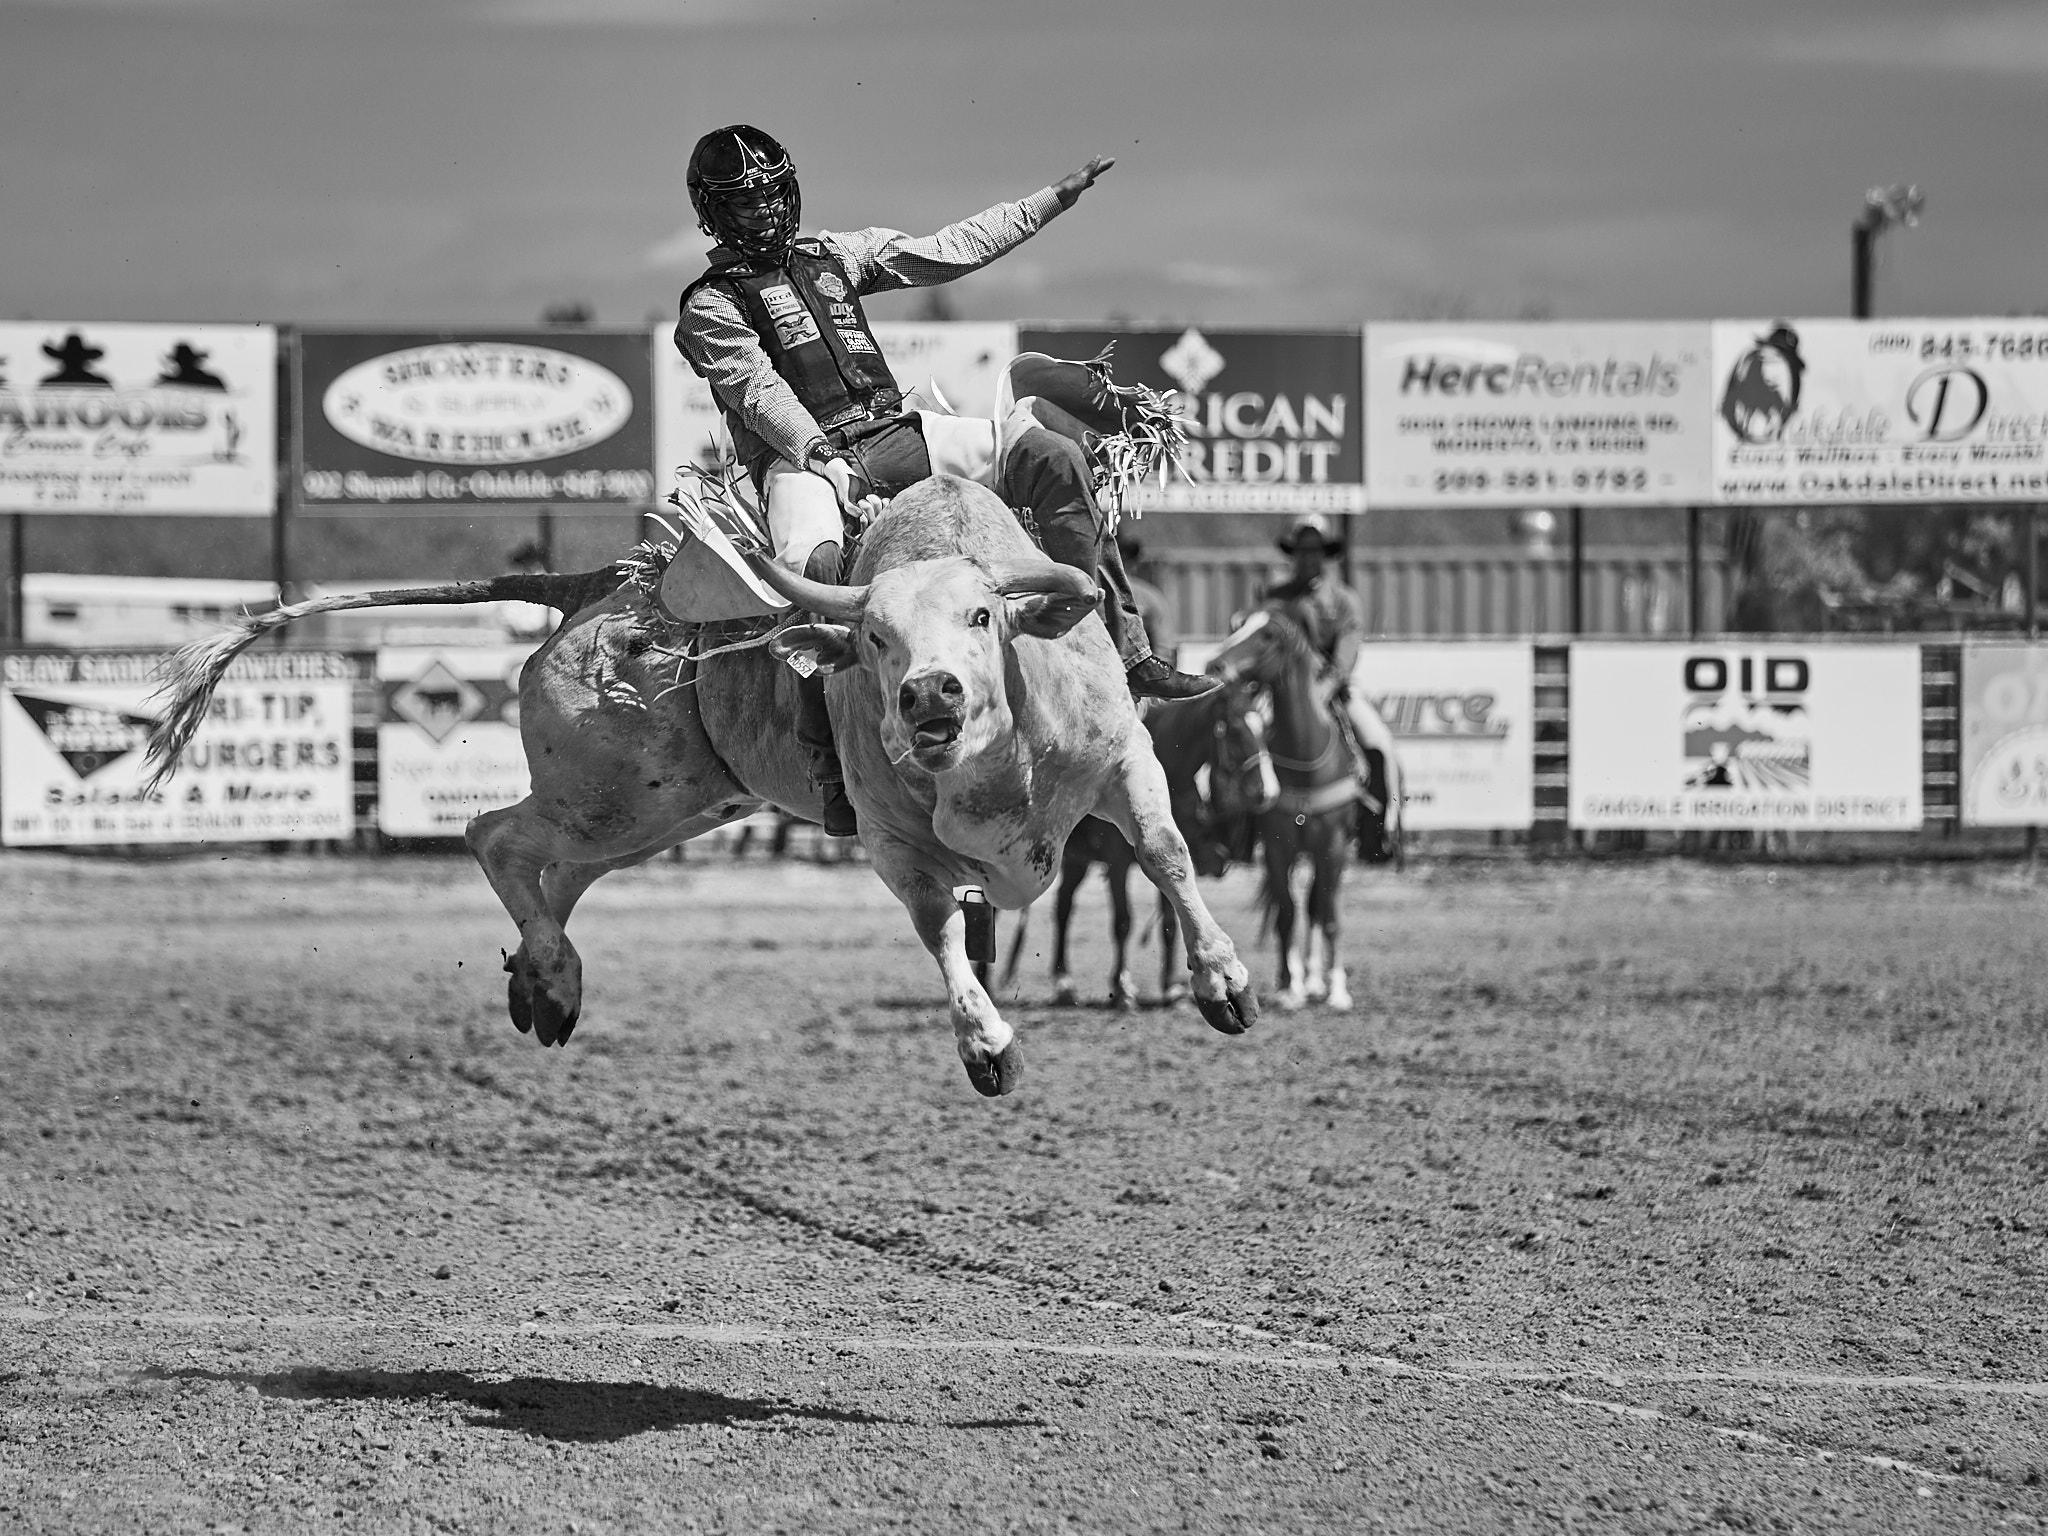 Rodeo_2019_292.jpg